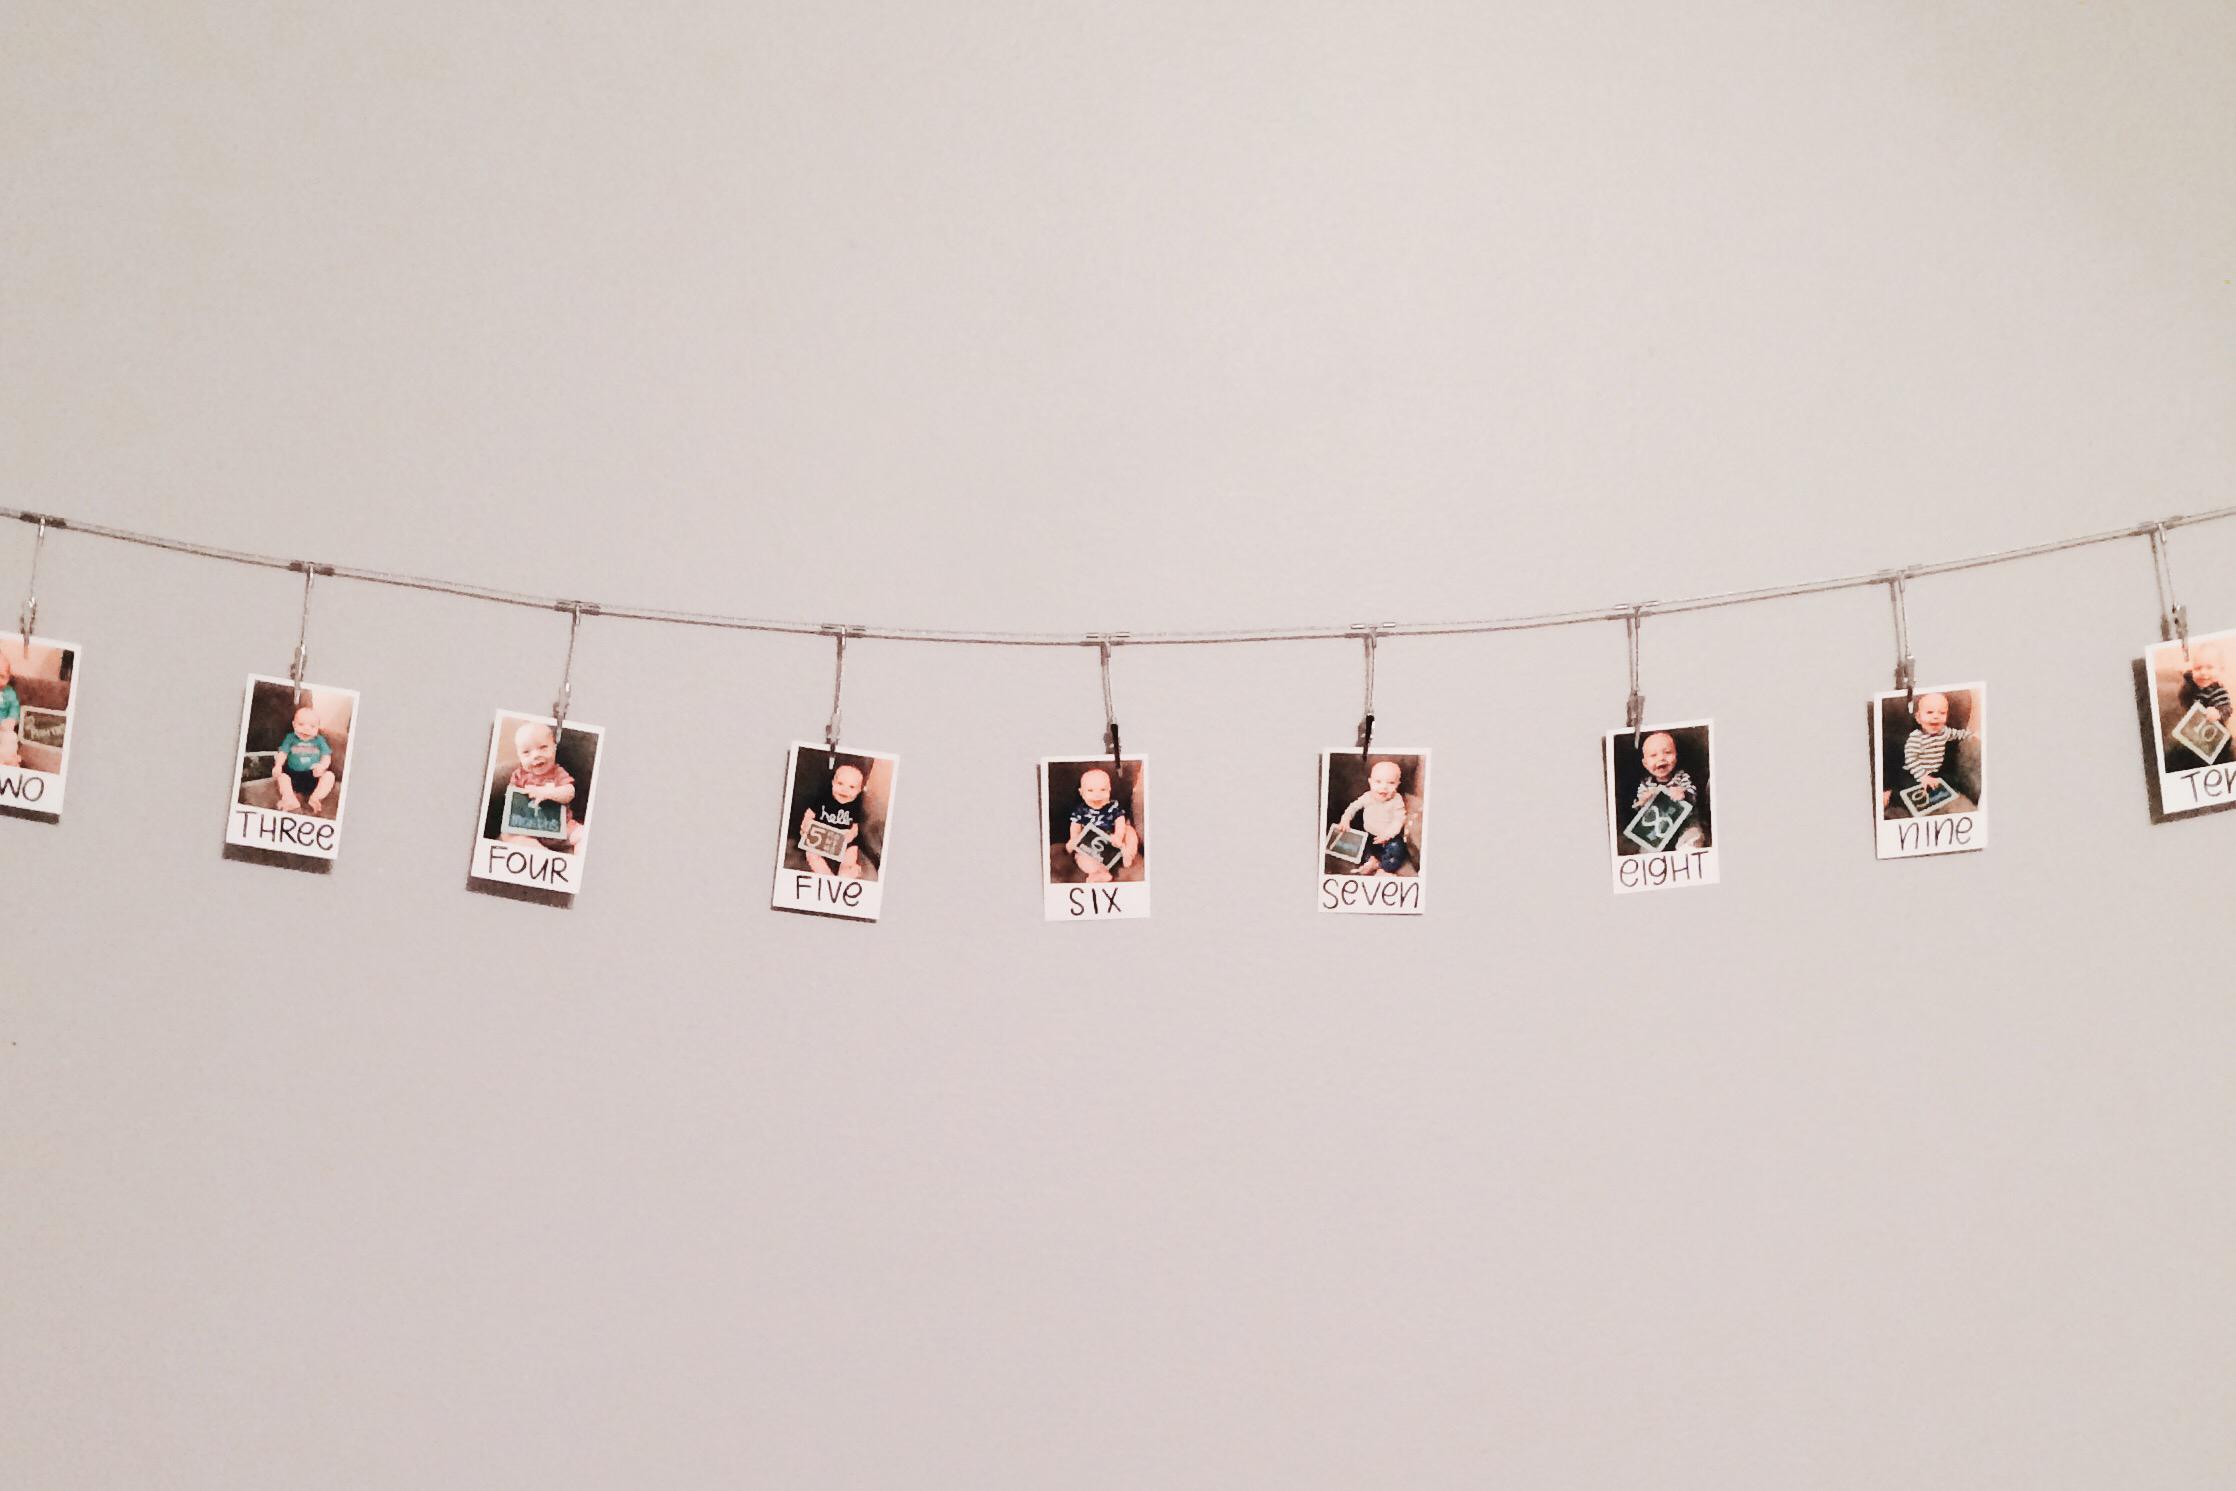 Polaroid baby photos